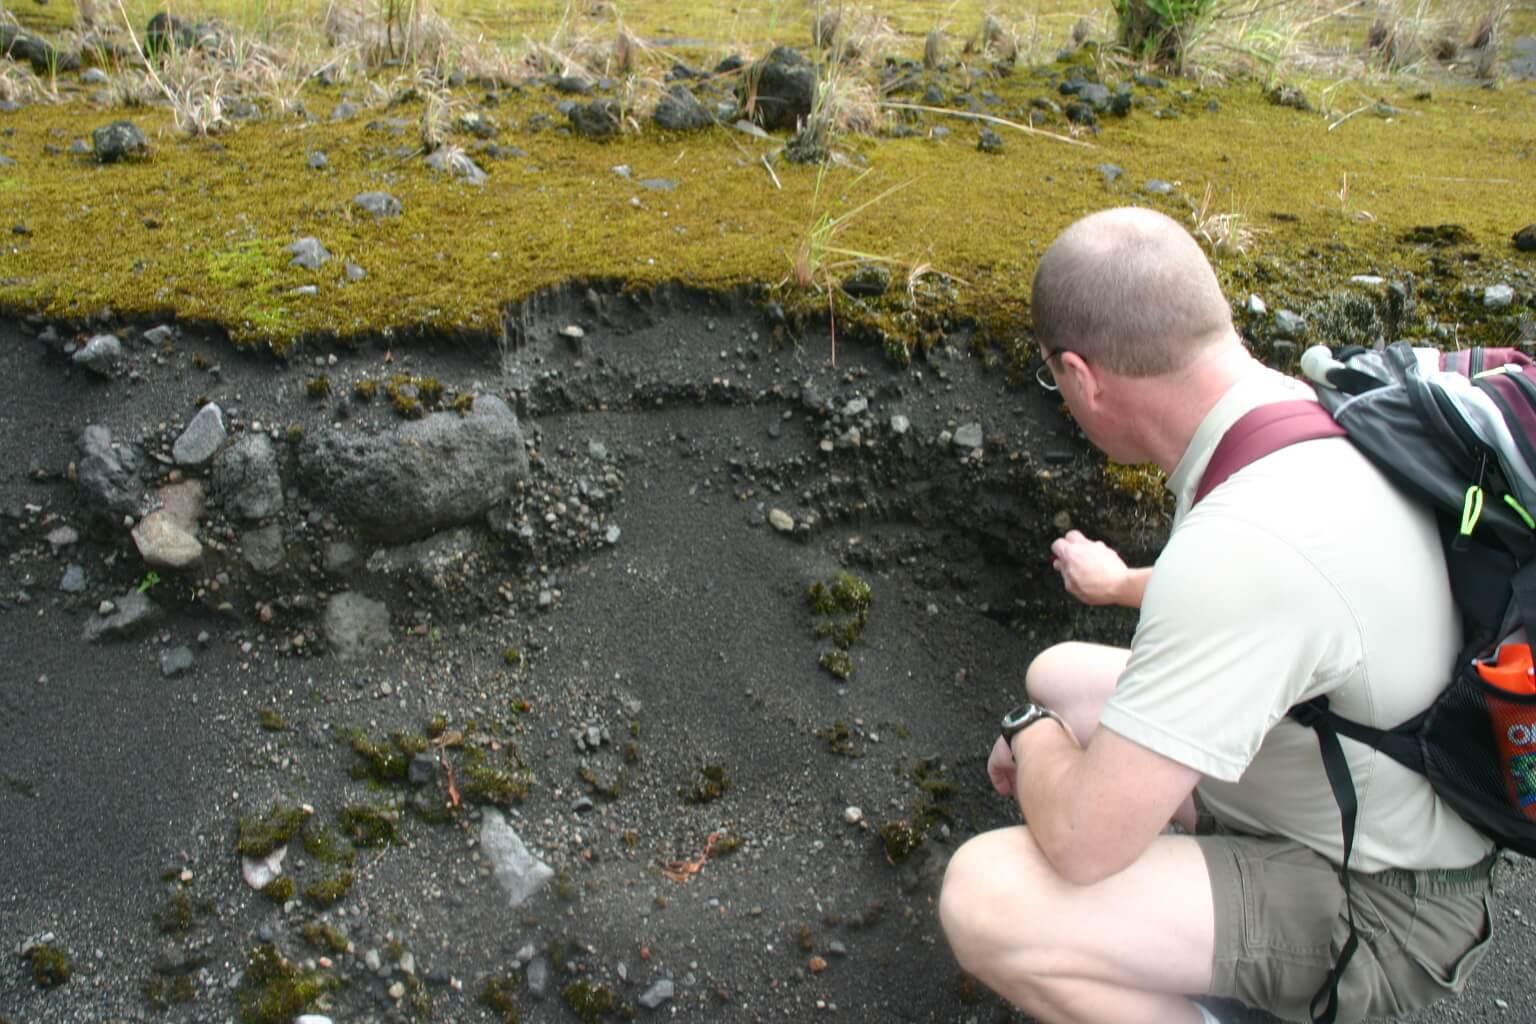 Lanchester Soil Consultants